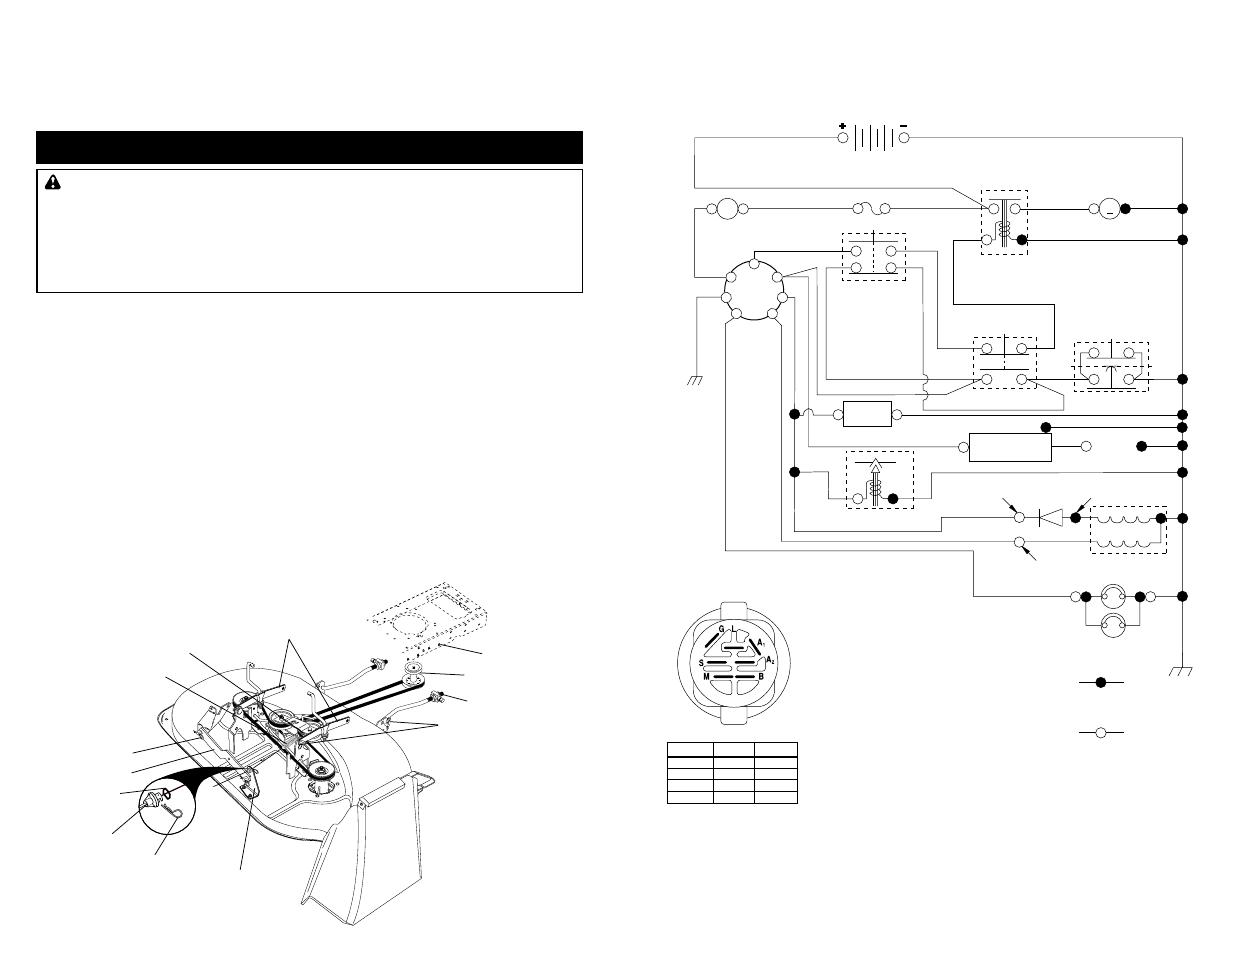 31 Ryobi Weed Eater Fuel Line Diagram